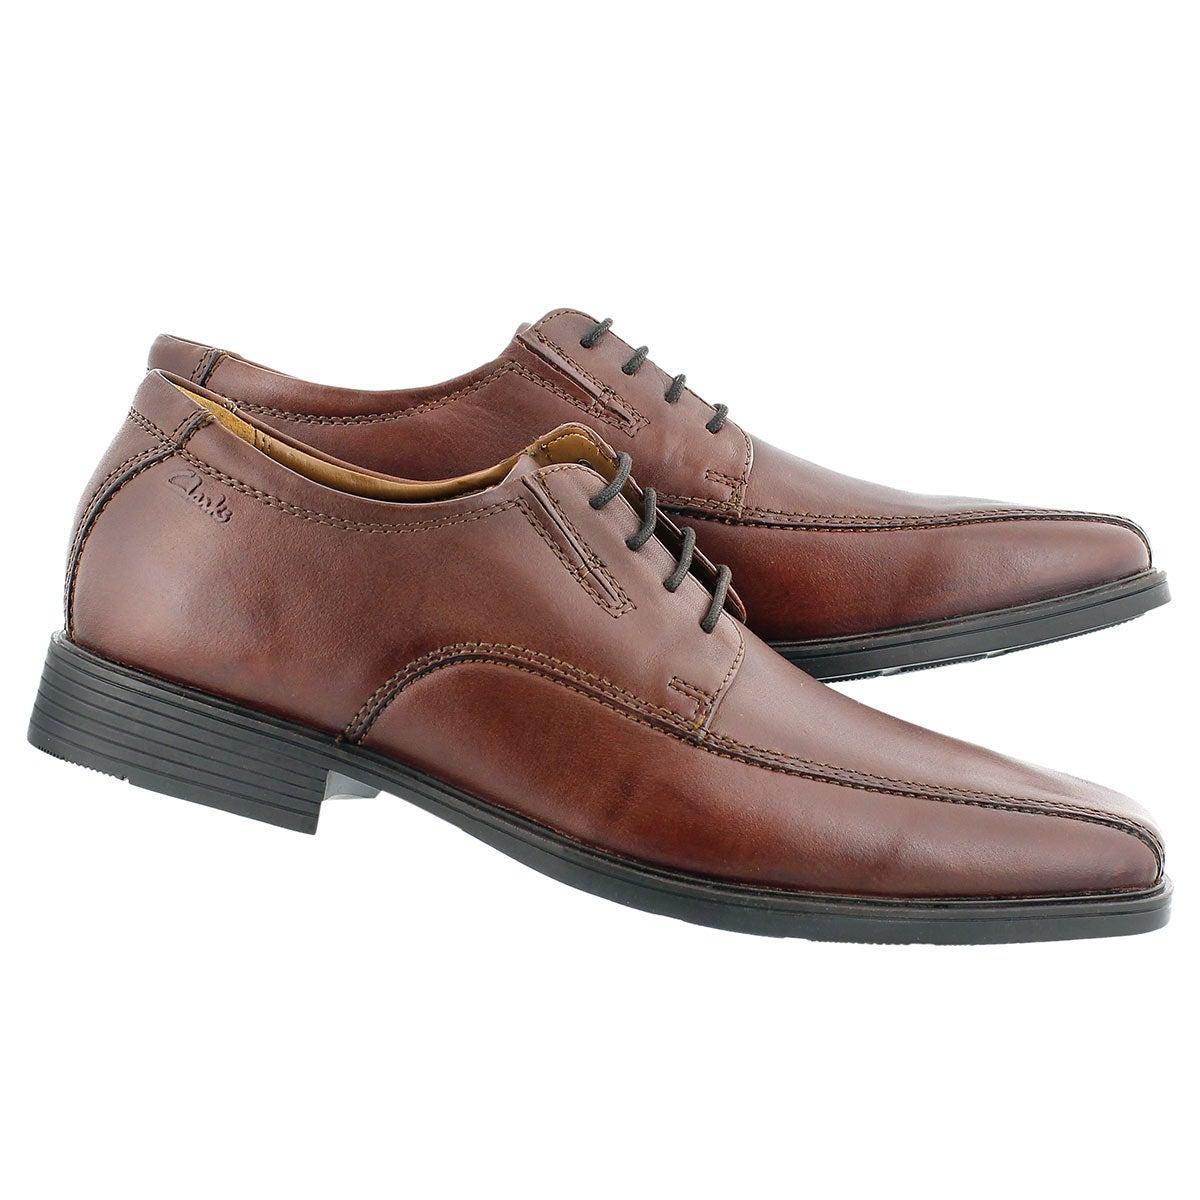 Mns Tilden Walk brown dress oxford